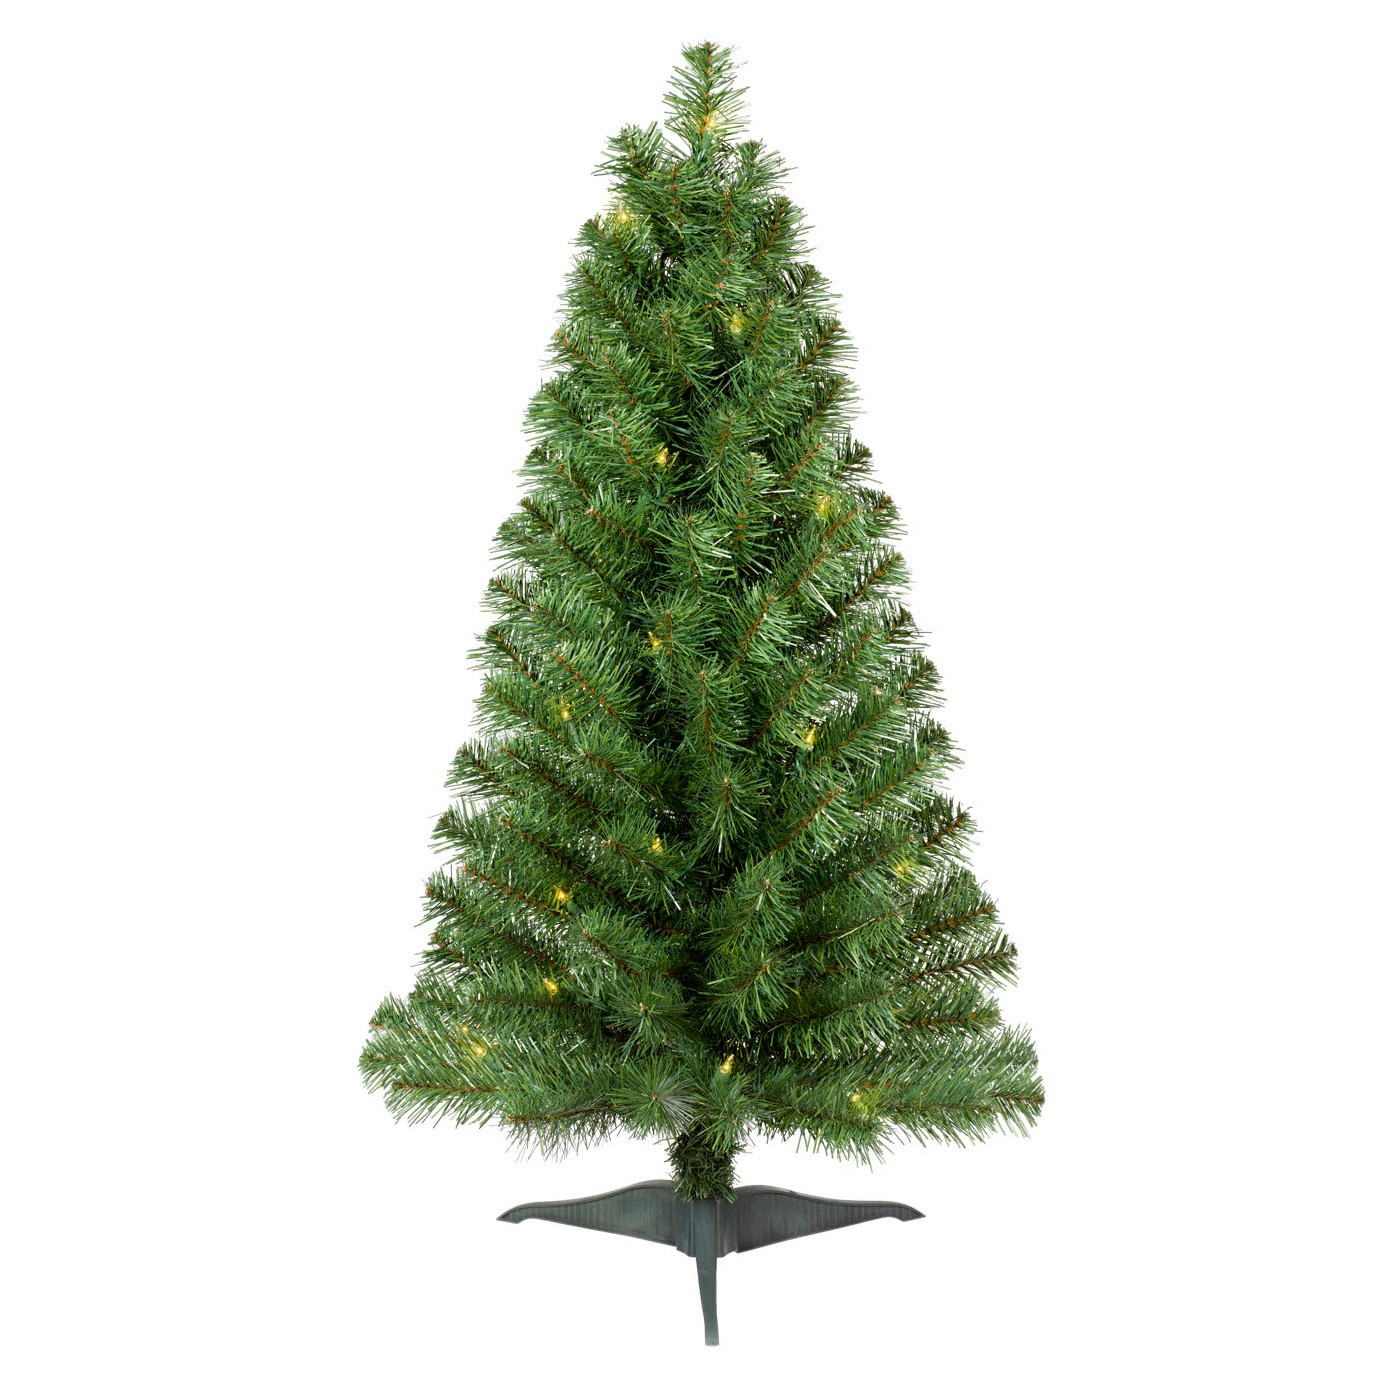 3ft Christmas Trees Artificial: 3ft Prelit Slim Artificial Christmas Tree Alberta Spruce